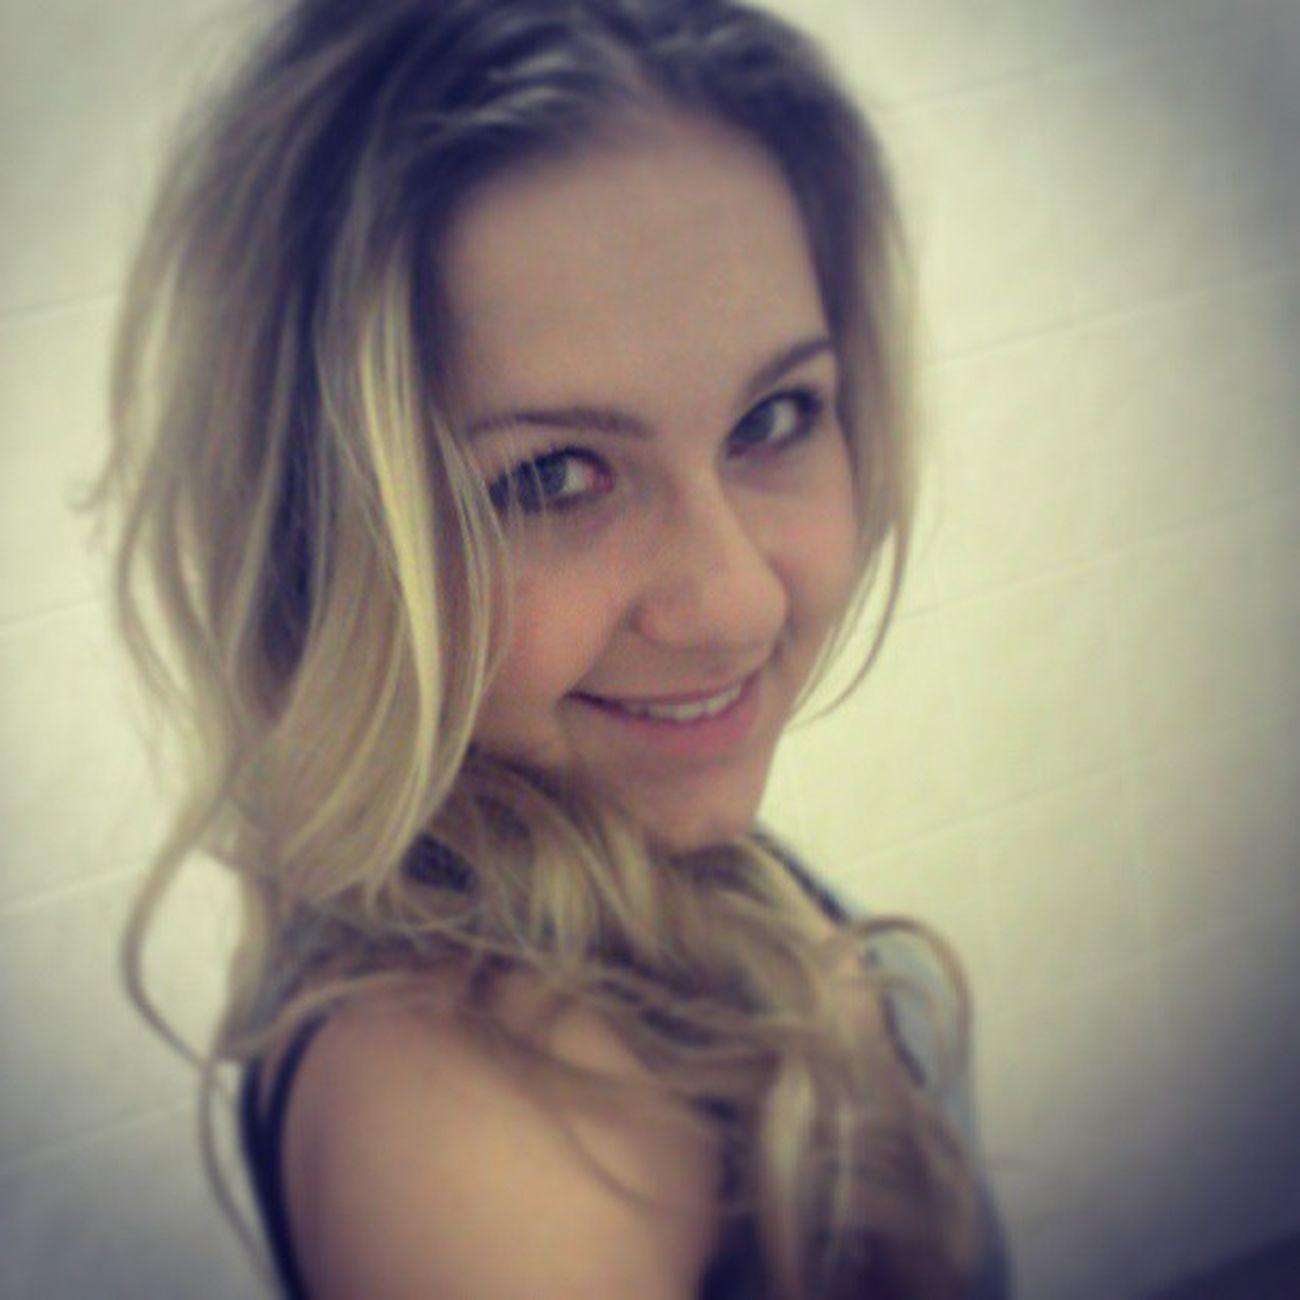 smile smile smile! :D Blondie Prettygirlswag Infinity Much picoftheday instalady smile instasmile swag work job sexy style nice hair